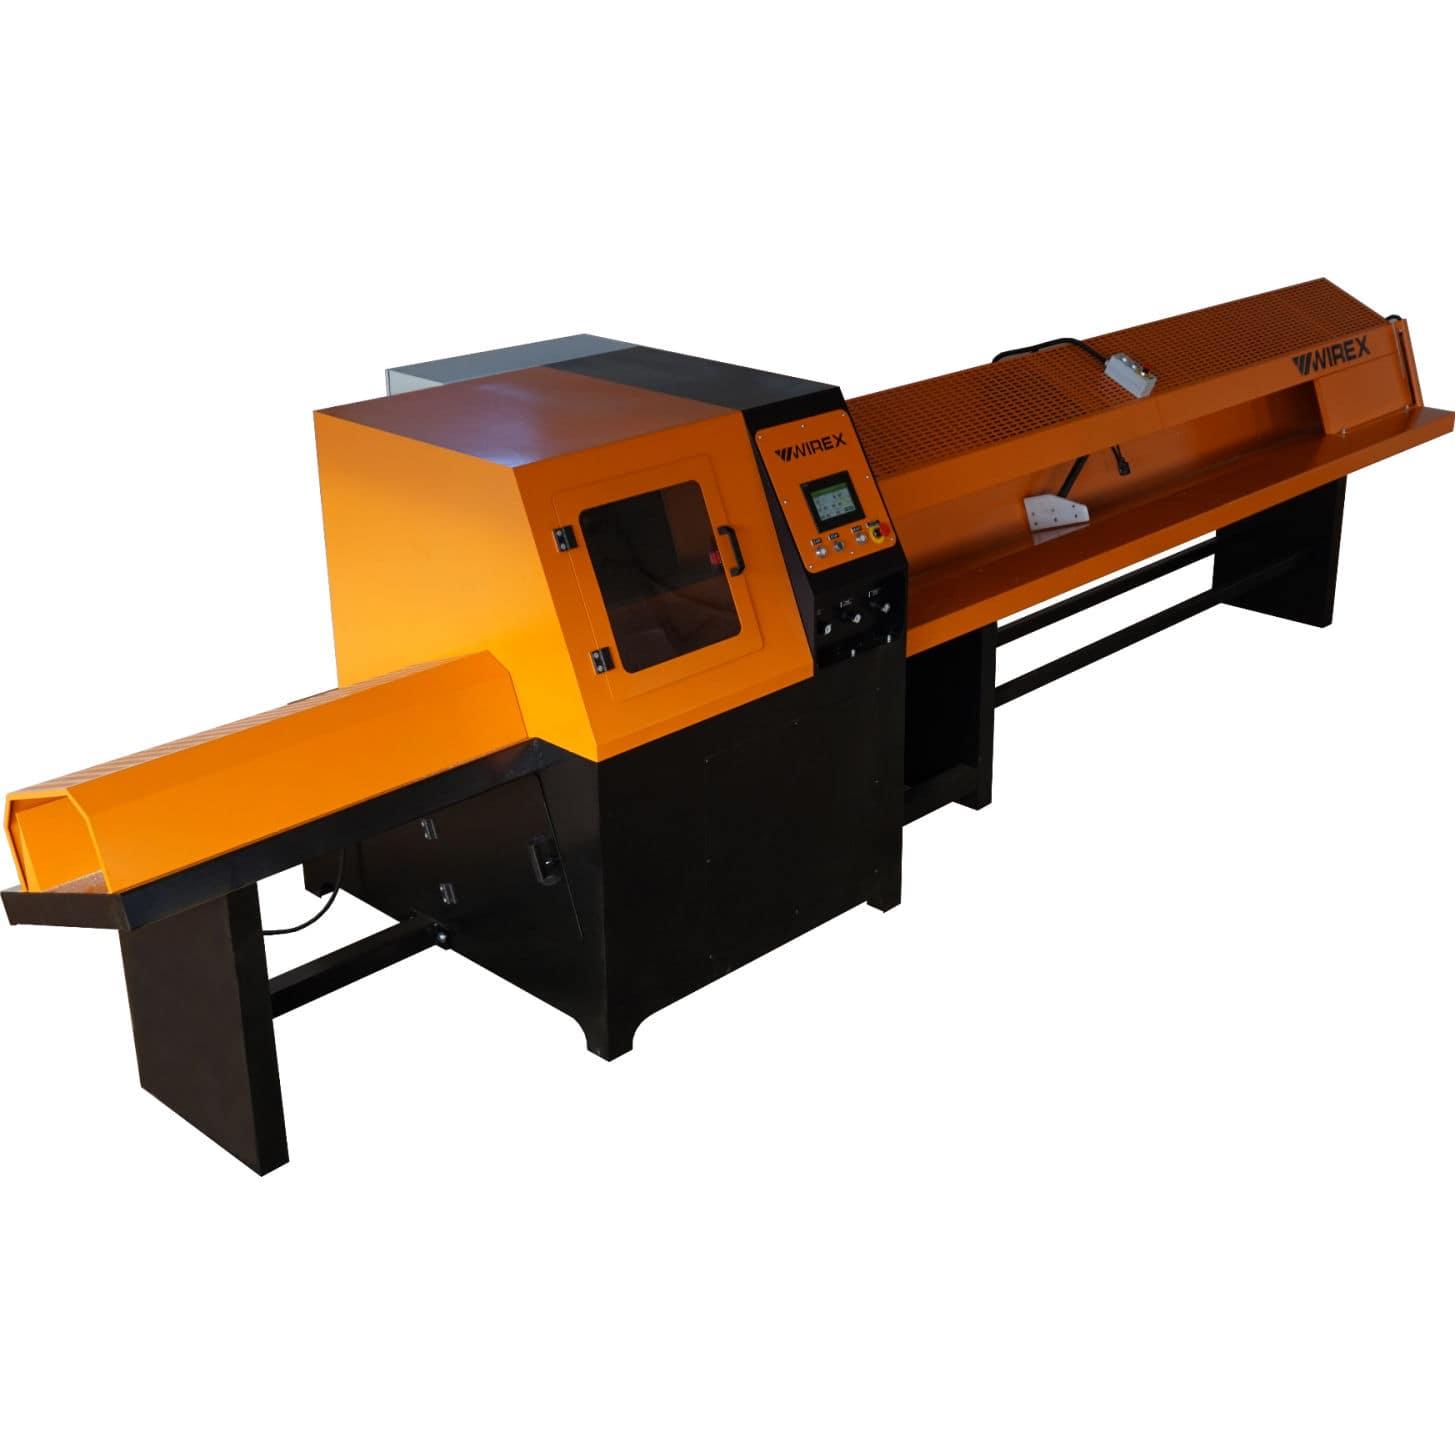 Circular sawmill / horizontal / stationary / electric F500 wirex